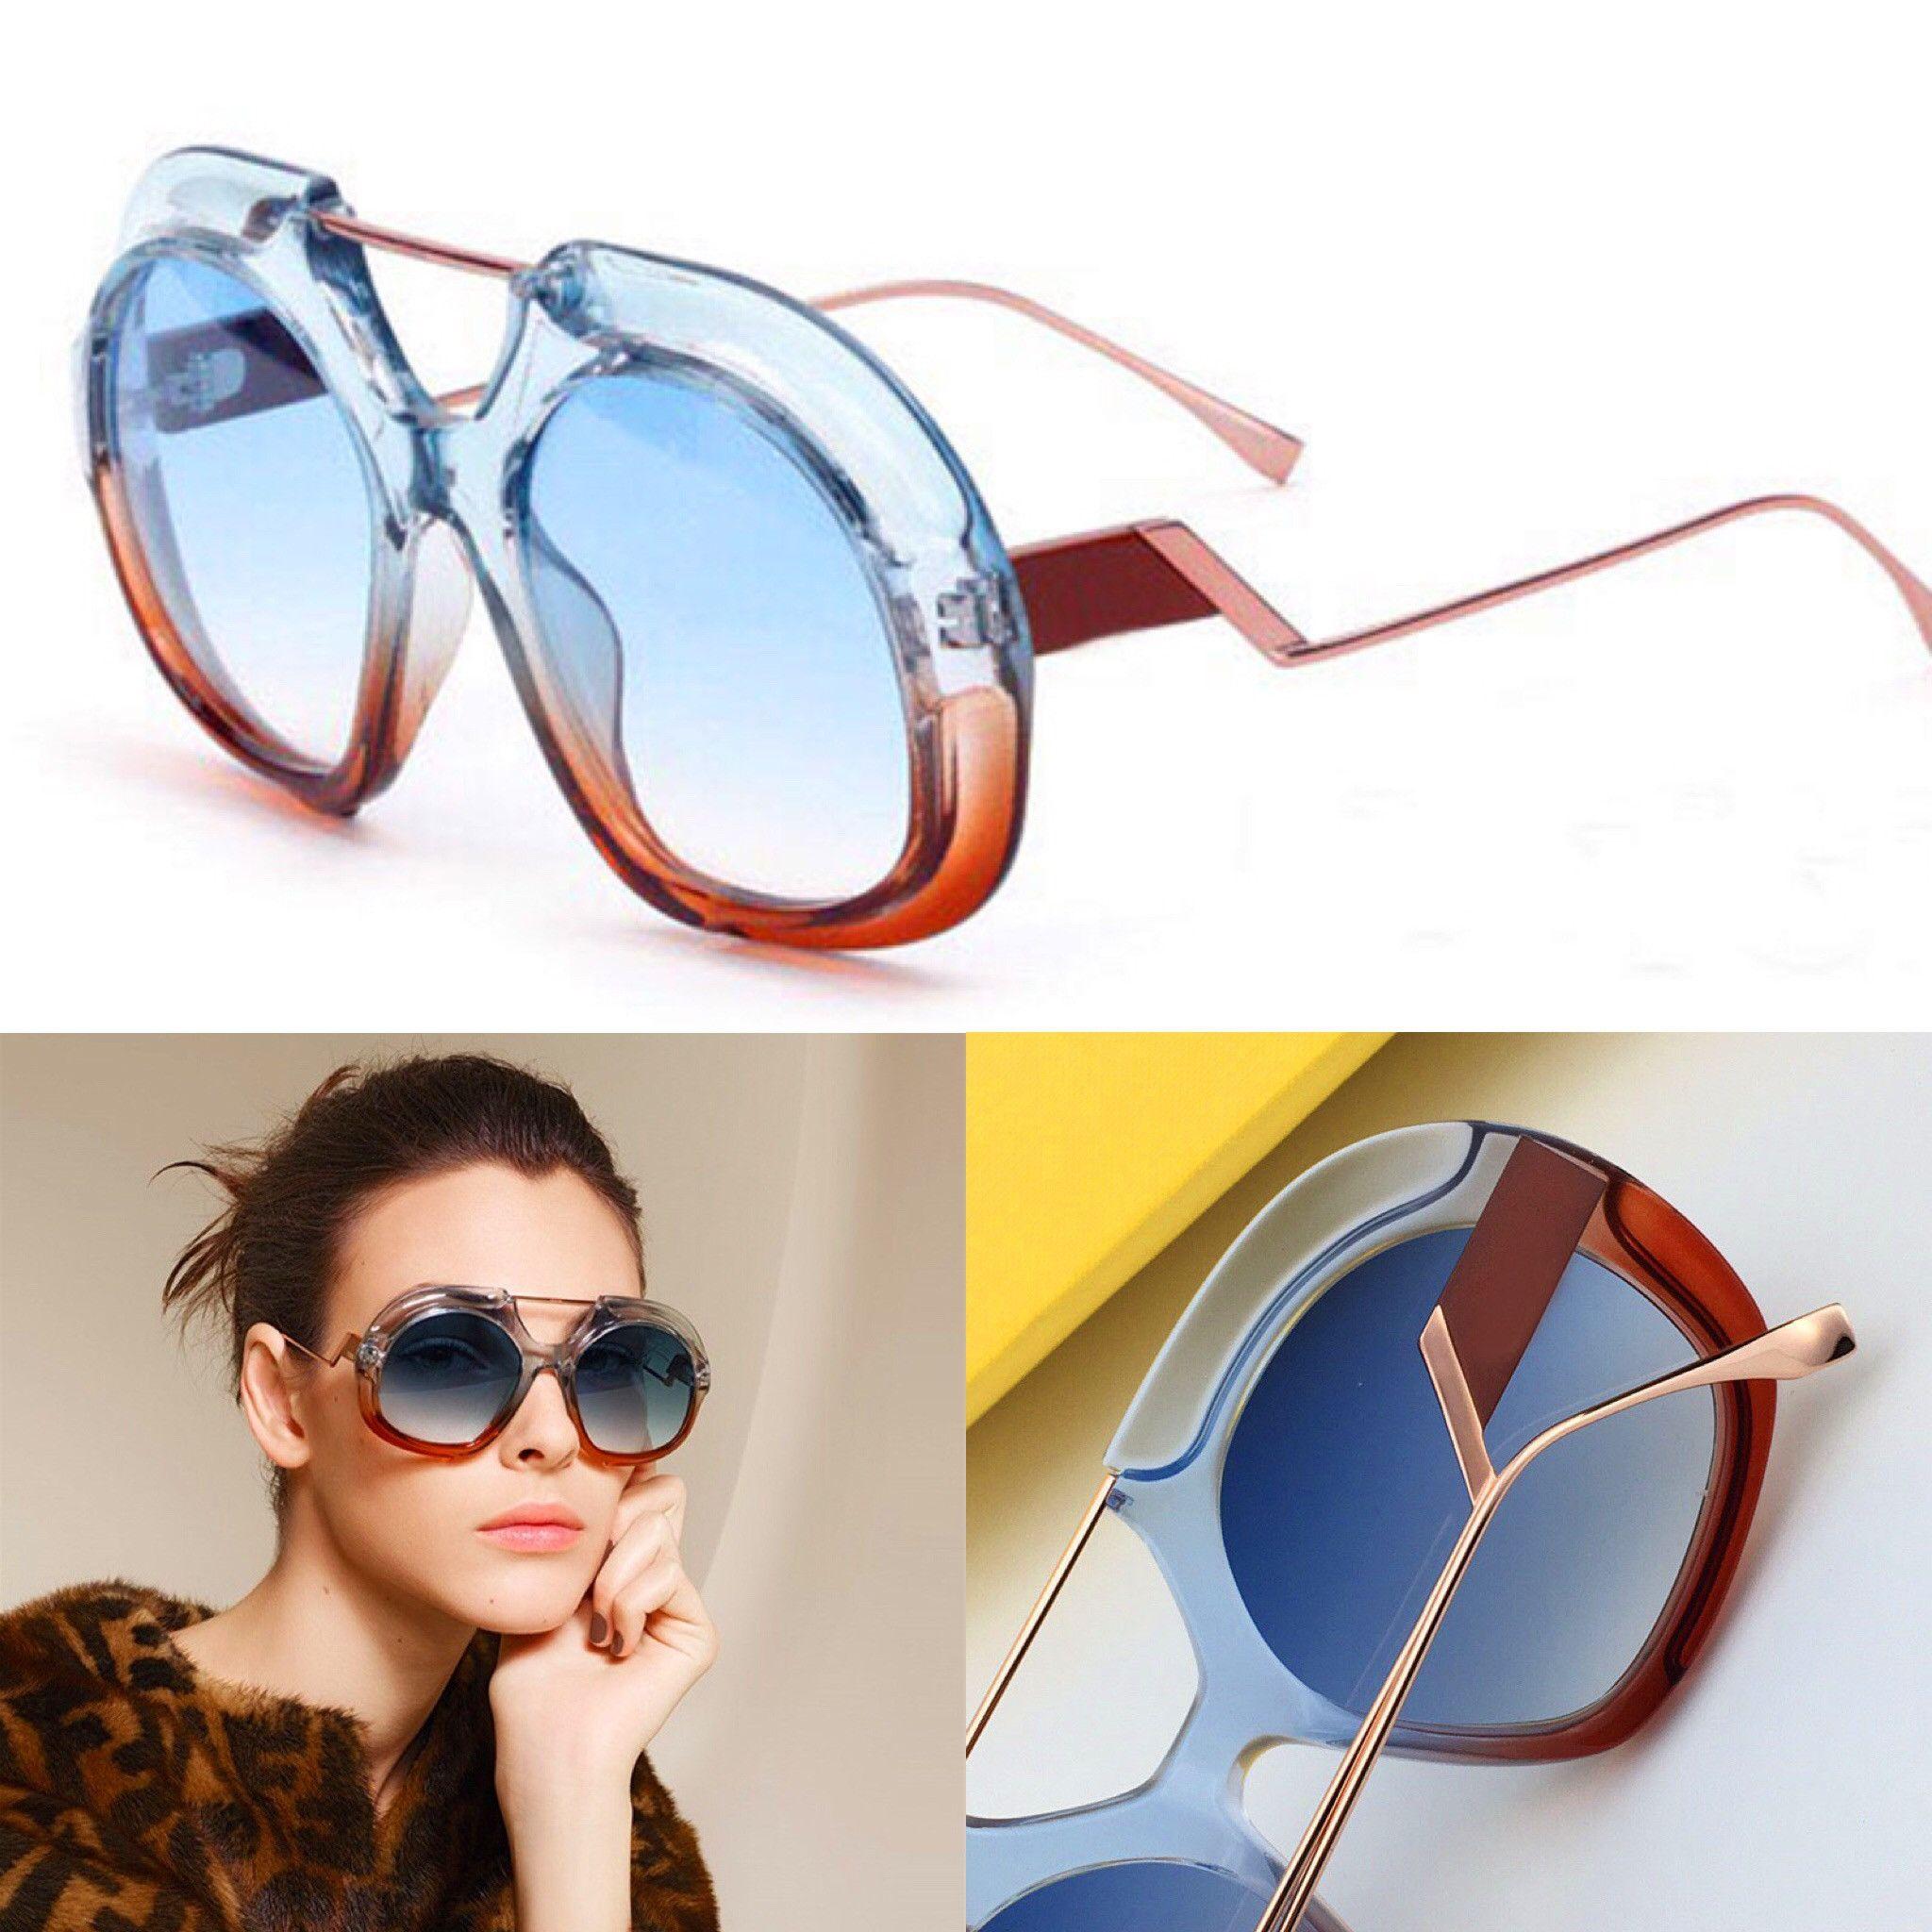 c0c13855955d New Fashion Designer Sunglasses 0316 Stitching Color Frame Avant Garde  Summer Style Uv400 Protection Eyewear For Women Top Quality Cheap  Prescription ...